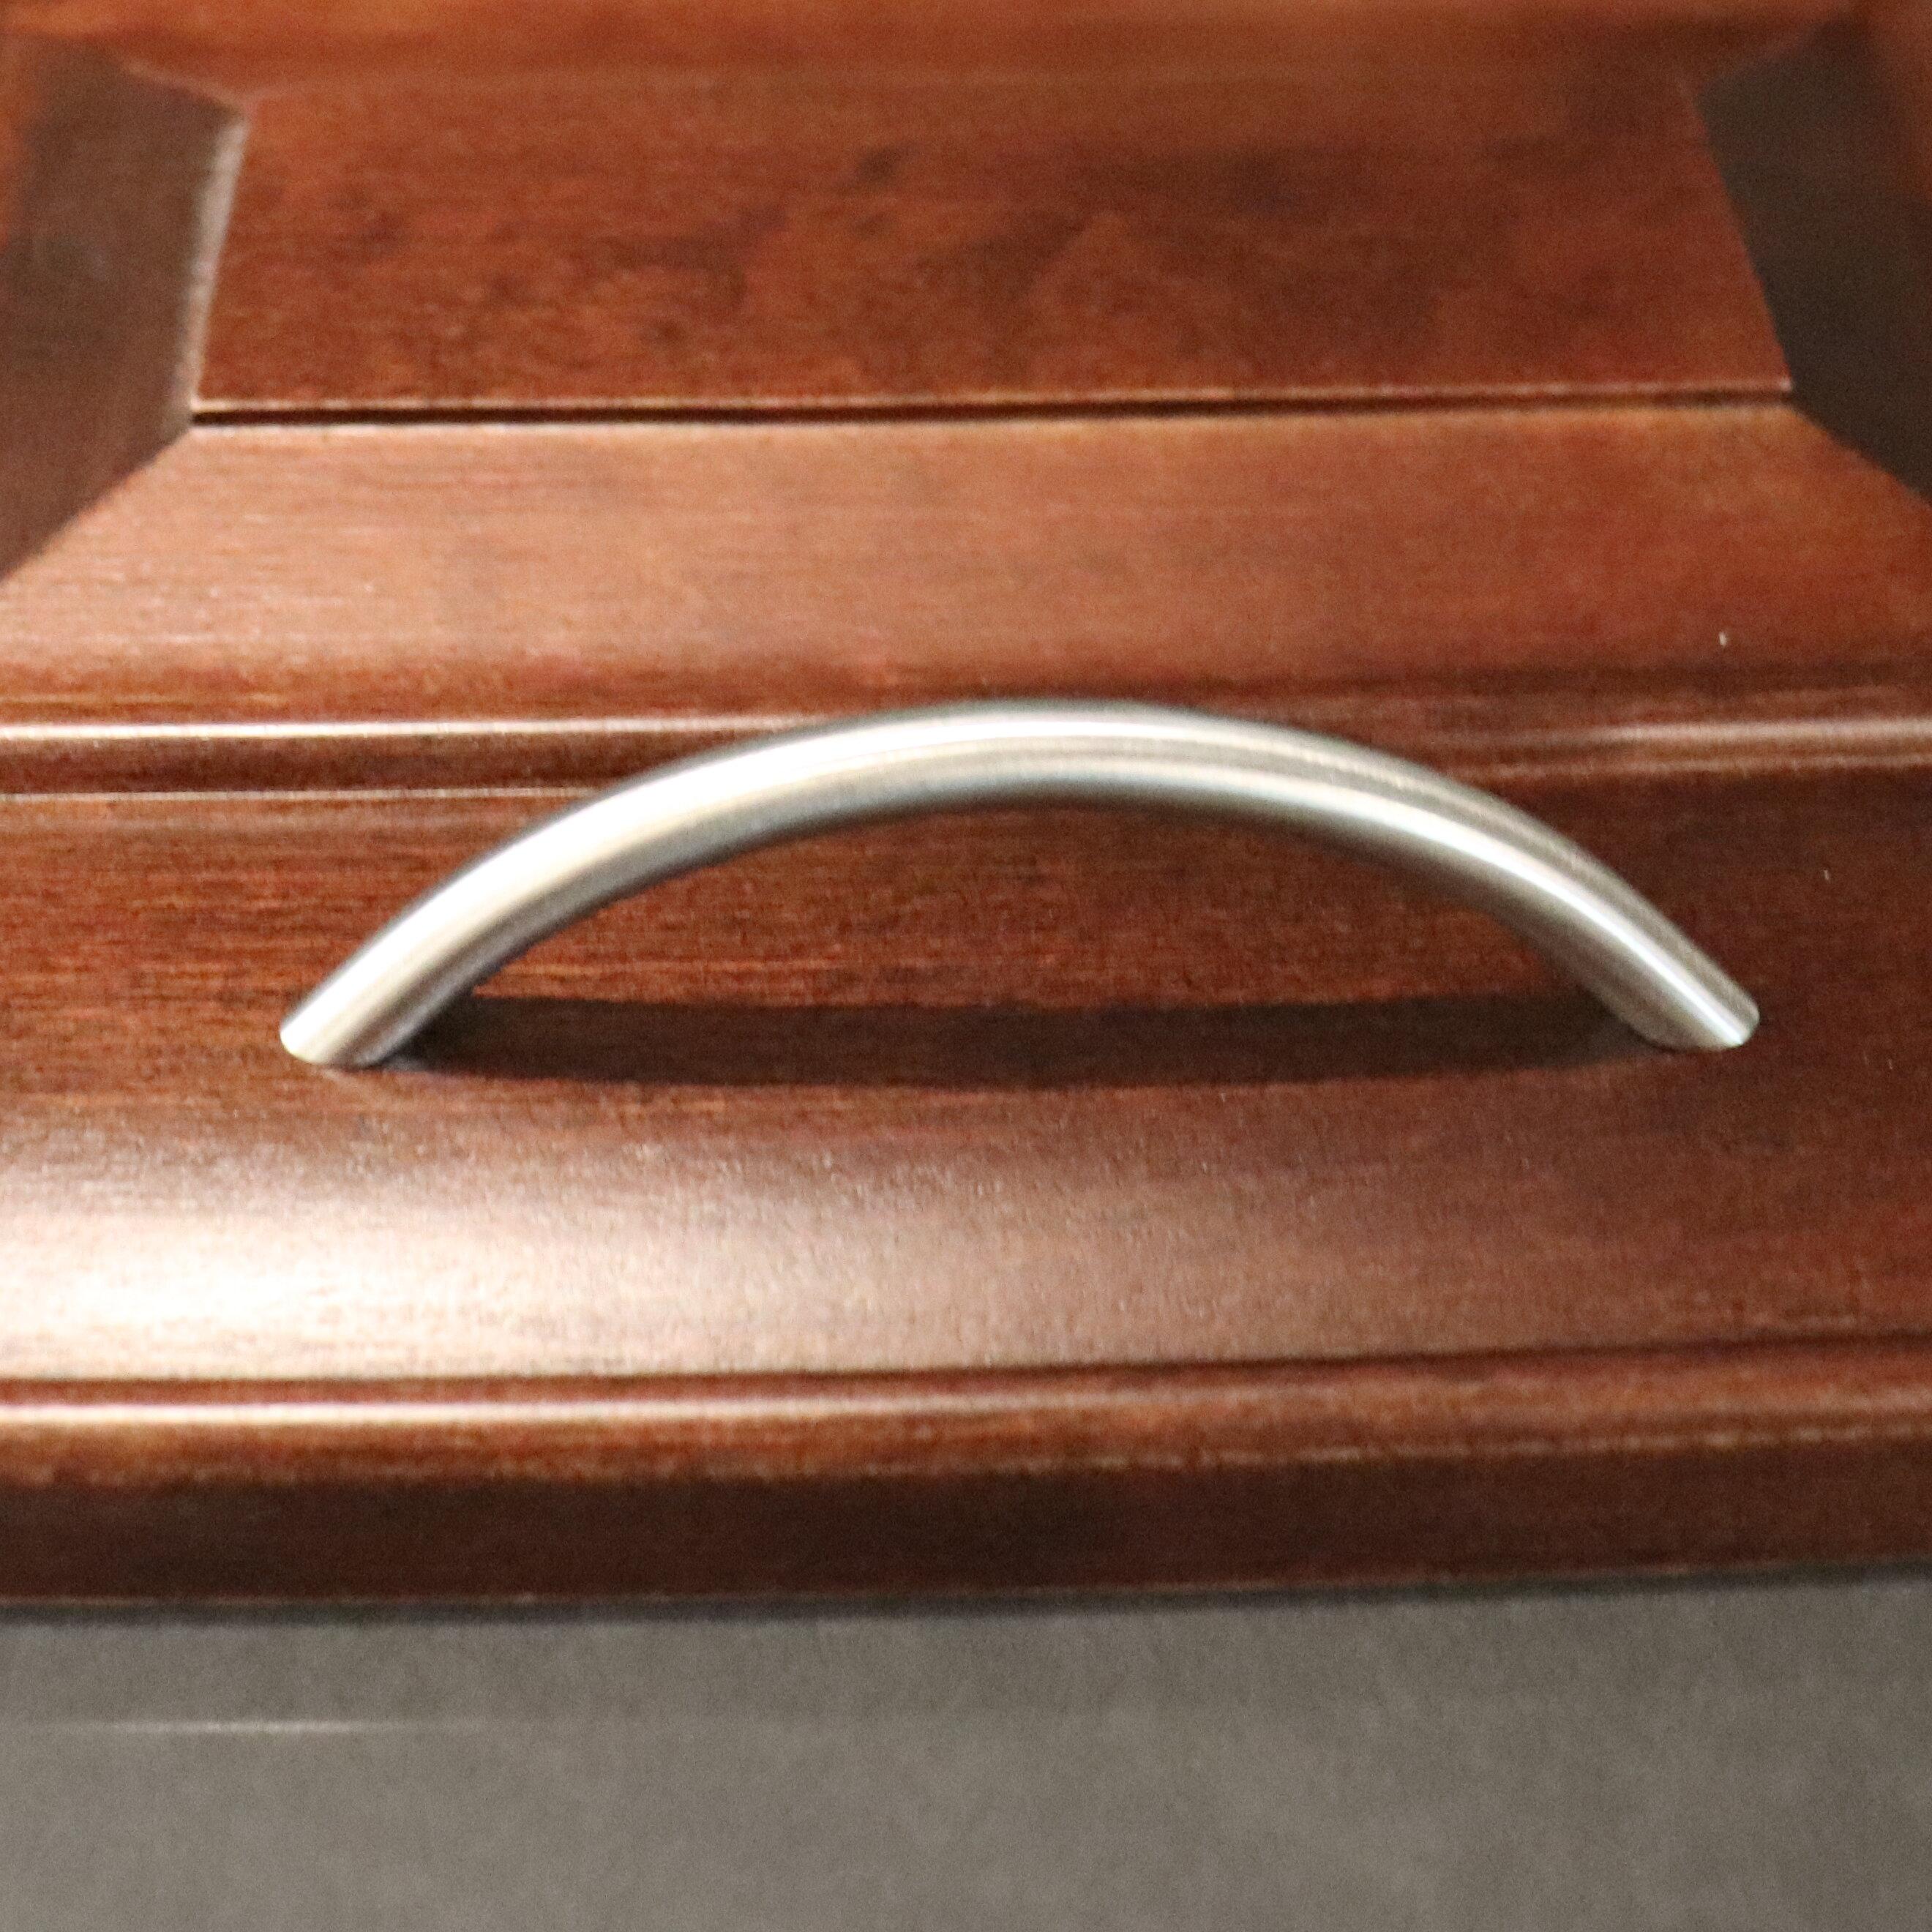 Stainless Steel Degol Cabinet Drawer Pulls You Ll Love In 2021 Wayfair